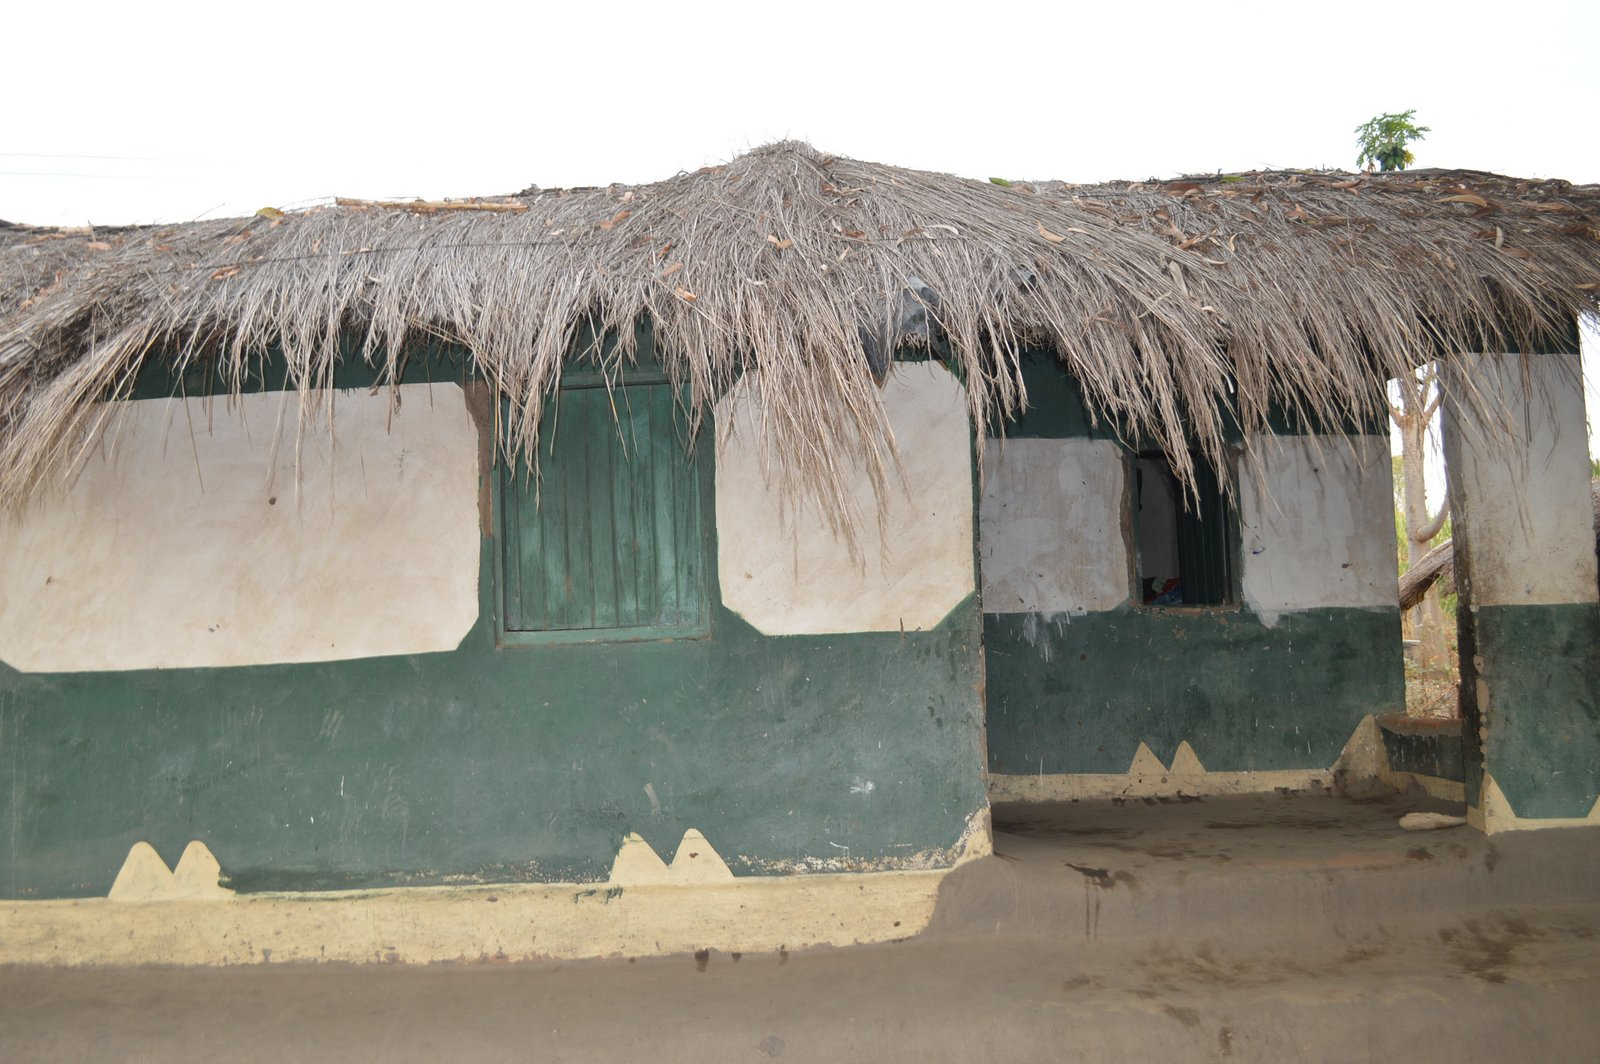 Chikasima, Nkhata Bay (2).JPG